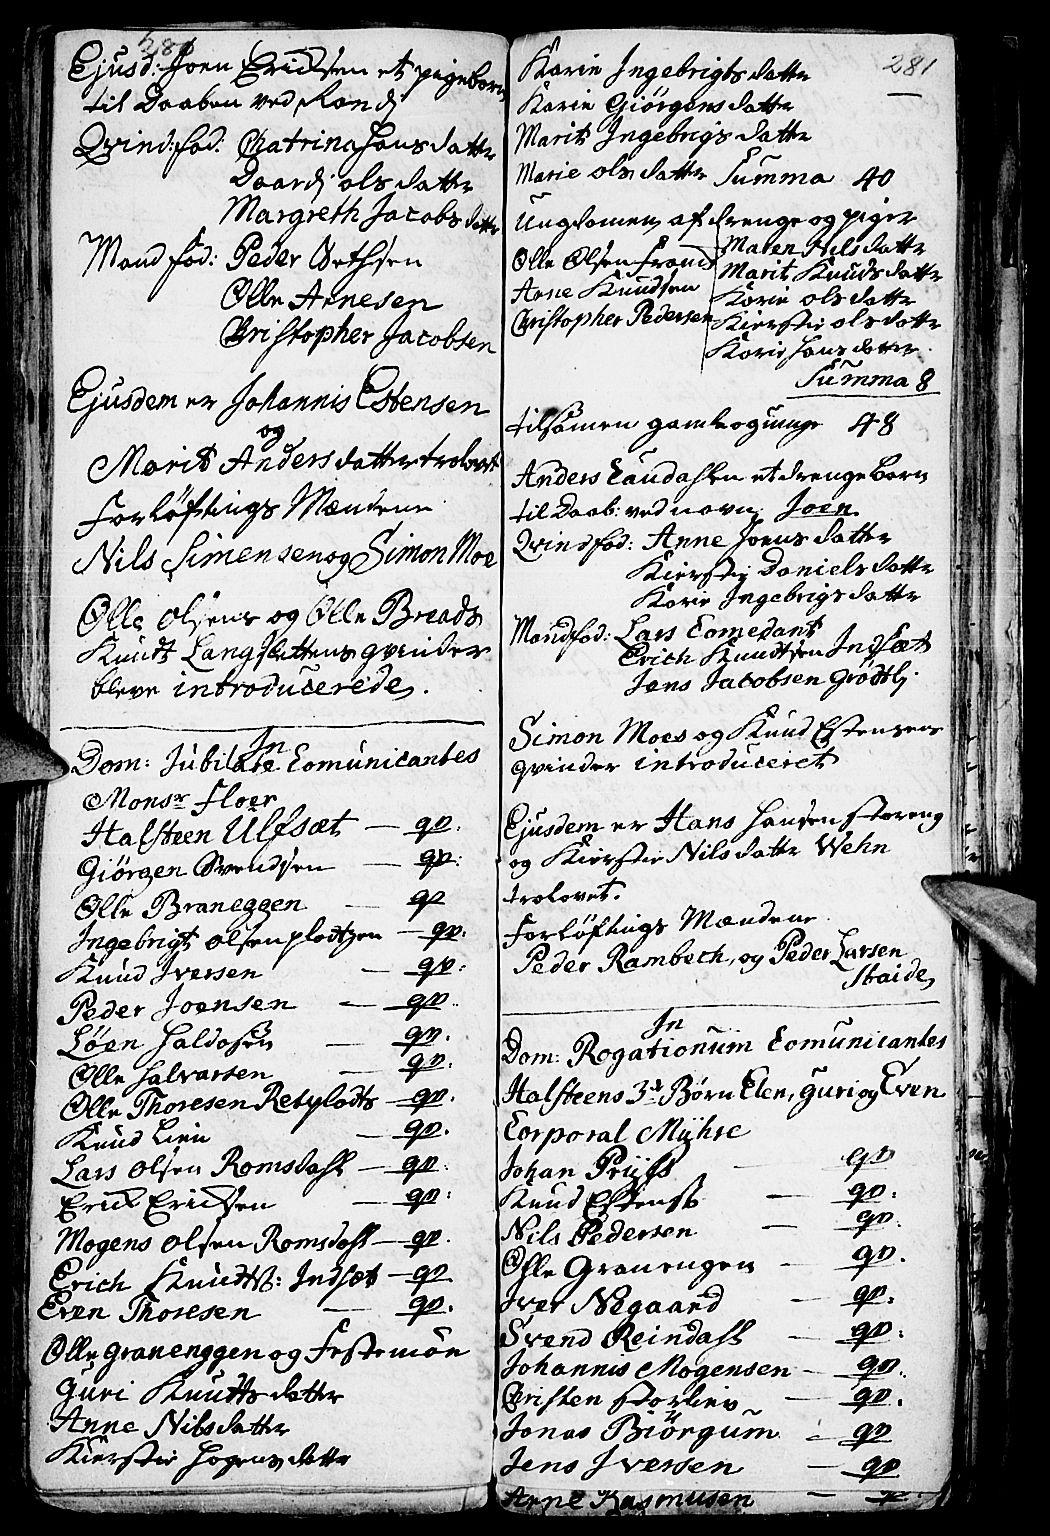 SAH, Kvikne prestekontor, Ministerialbok nr. 1, 1740-1756, s. 280-281